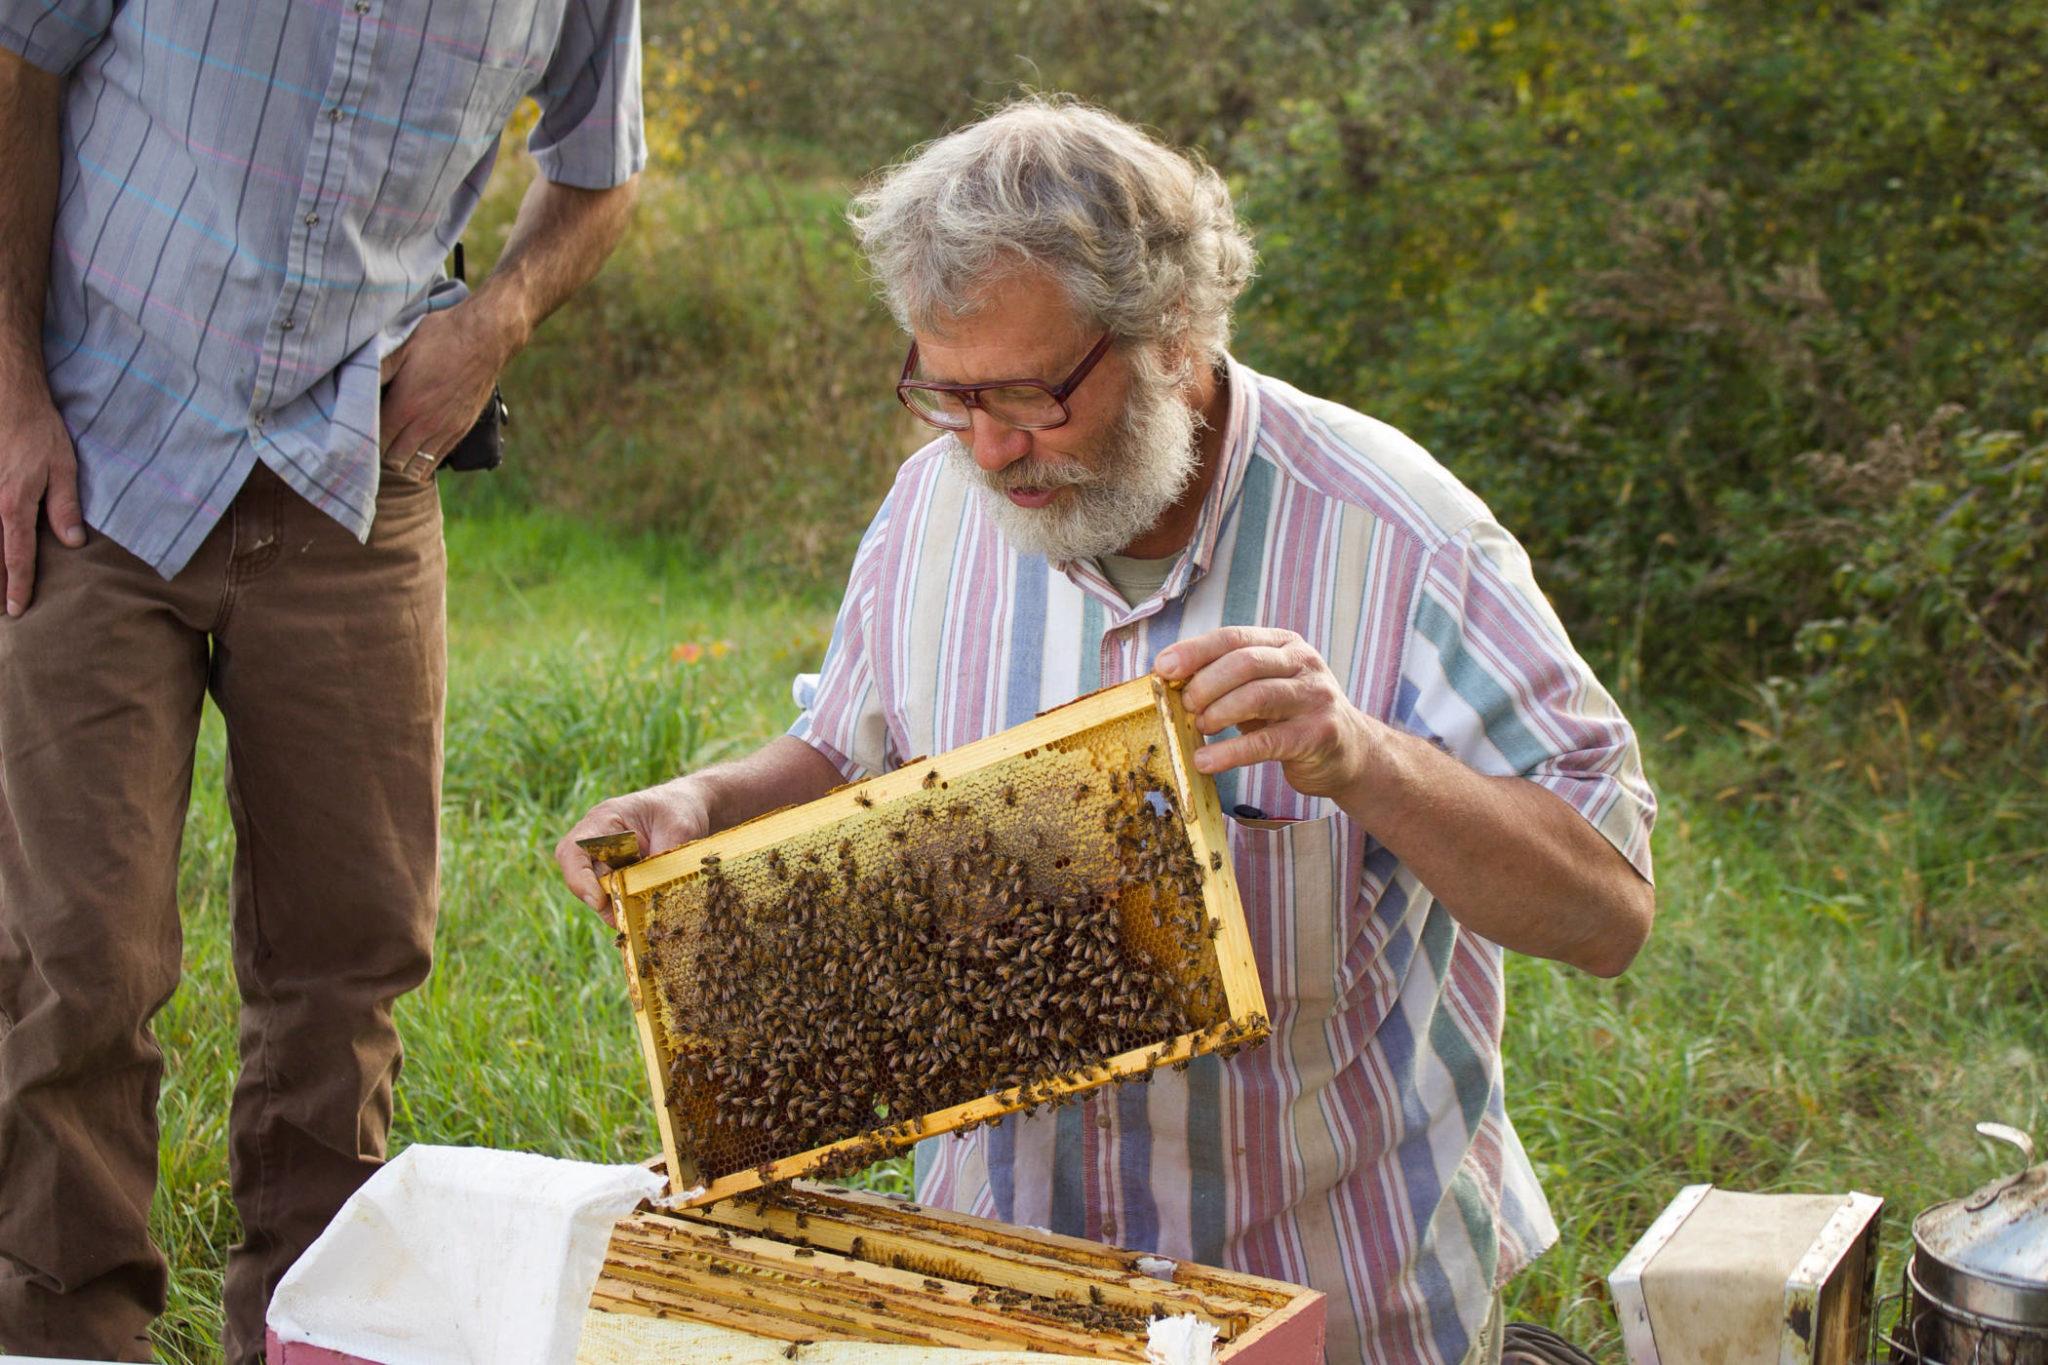 Treatment Free Beekeeping With Kirk Webster Rodale Institute